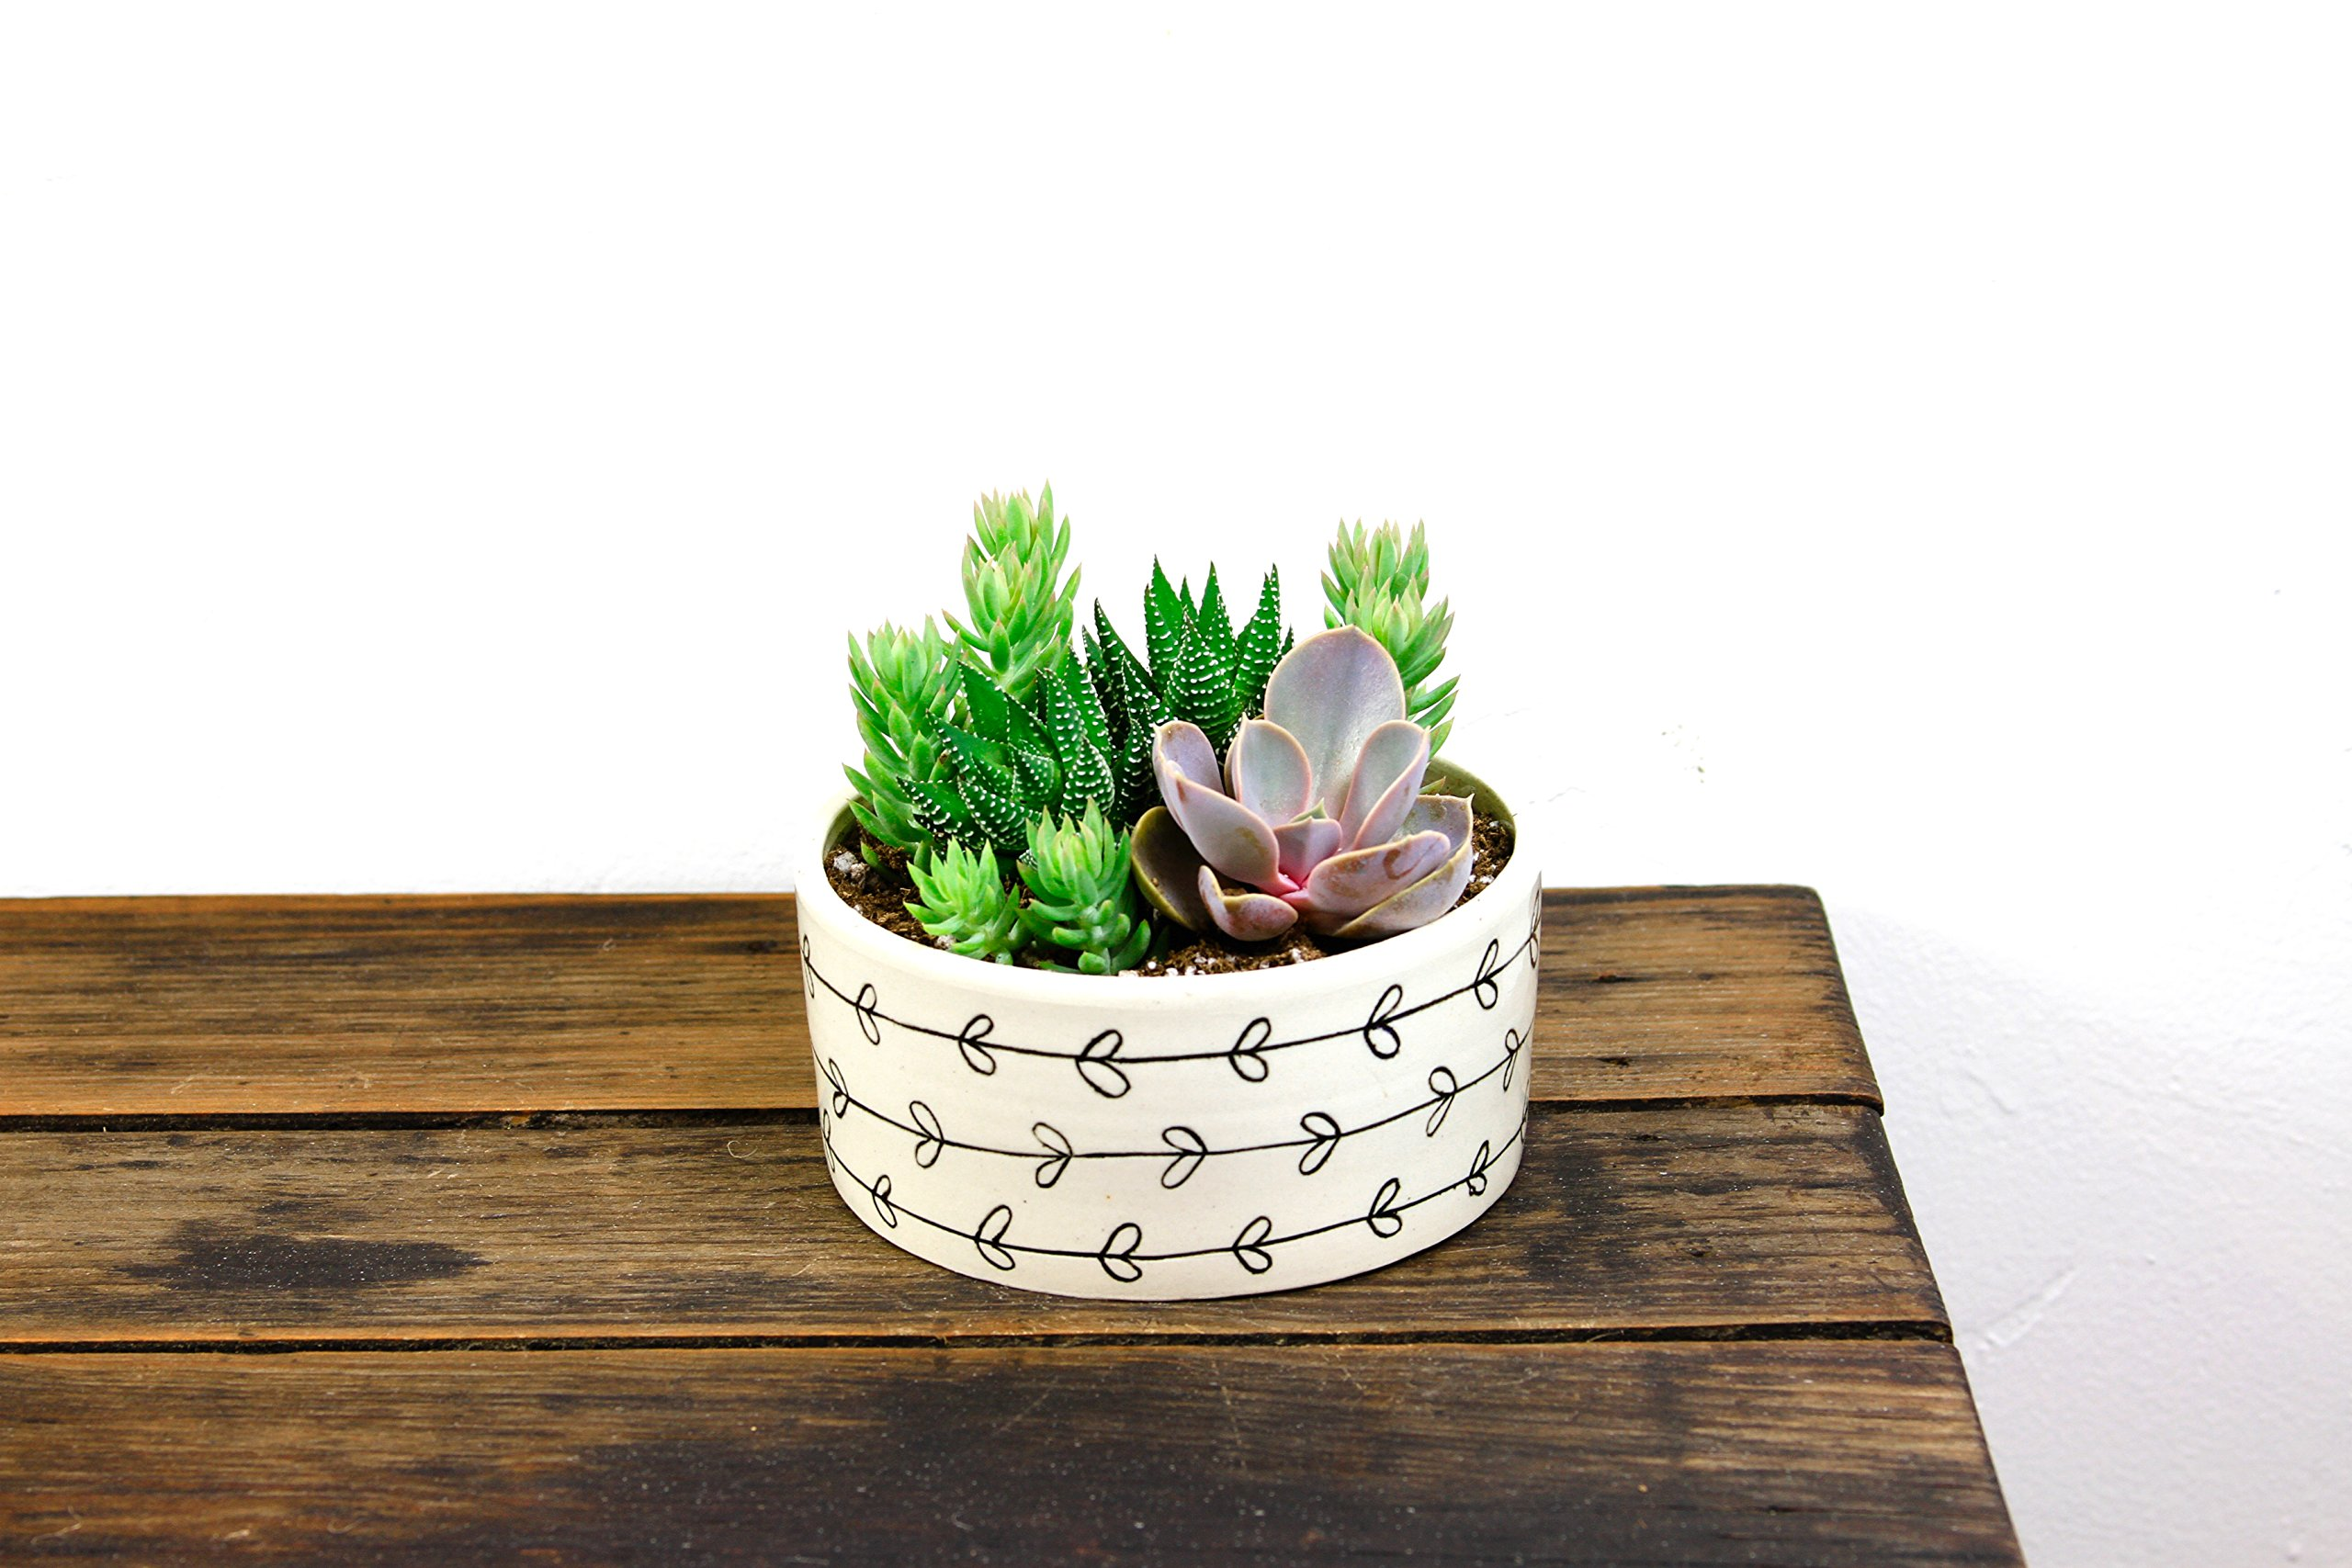 Shop Succulents Heart Vine Handmade Ceramic Planter with Succulents